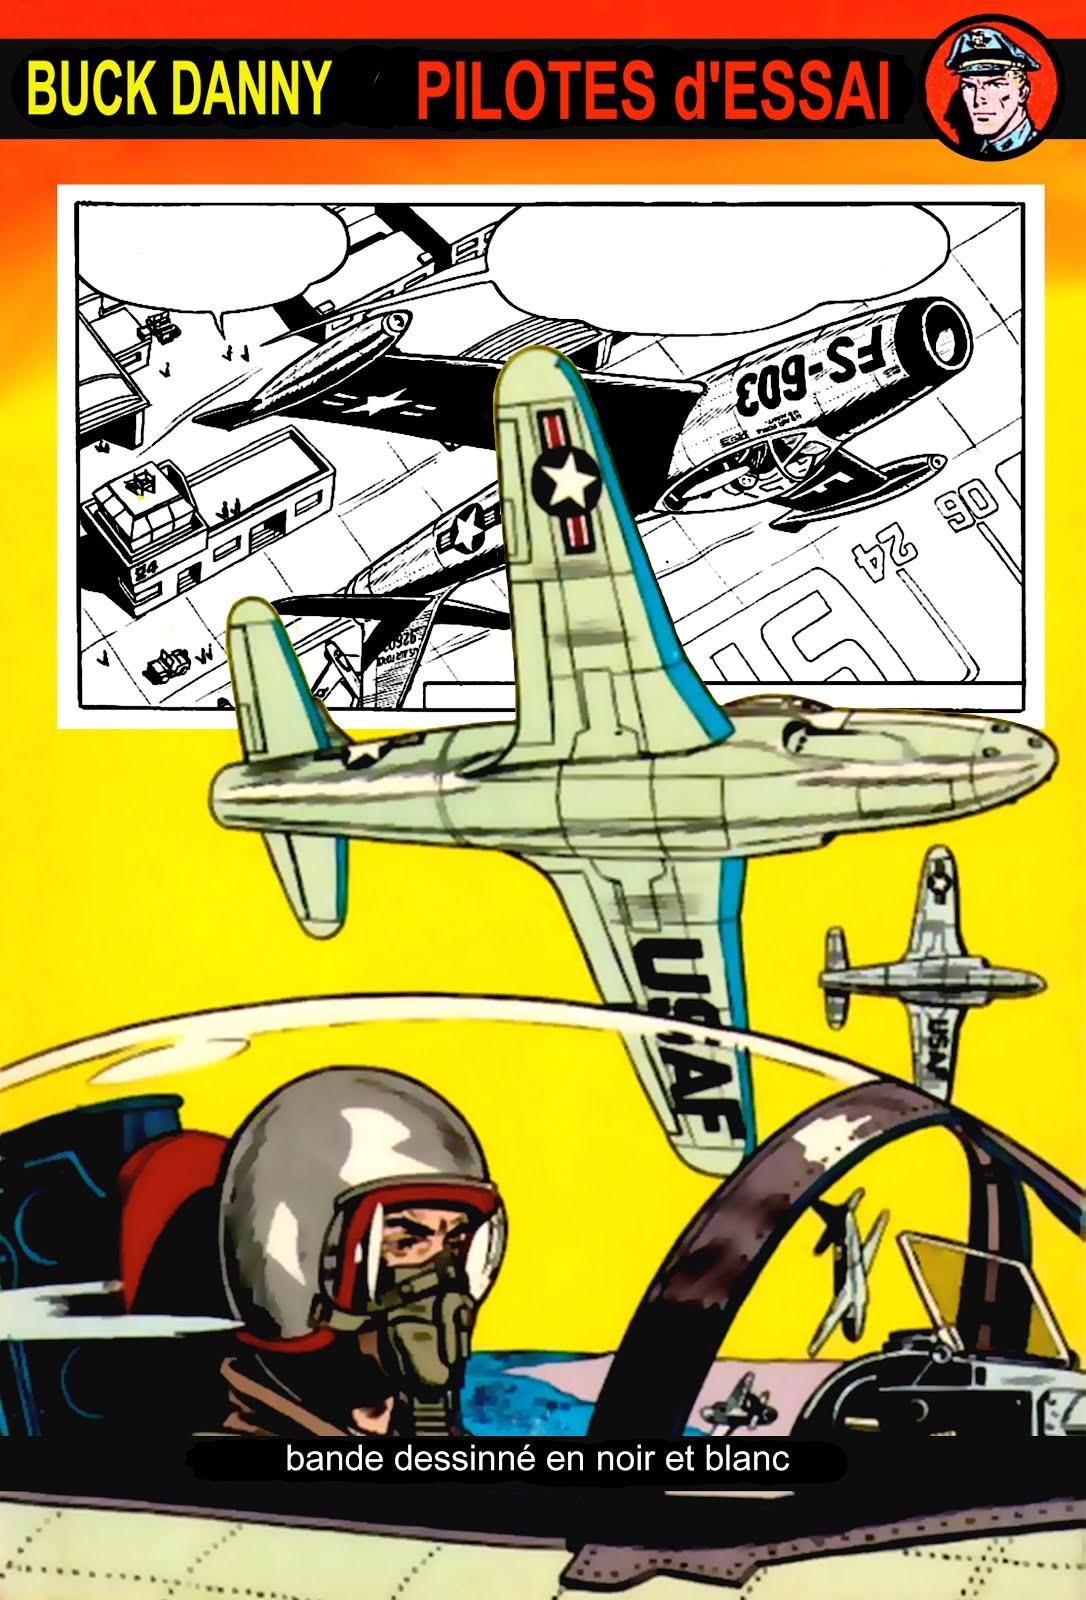 Buck Danny en noir / blanc - Pilotes d'Essai - Charlier & Hubinon